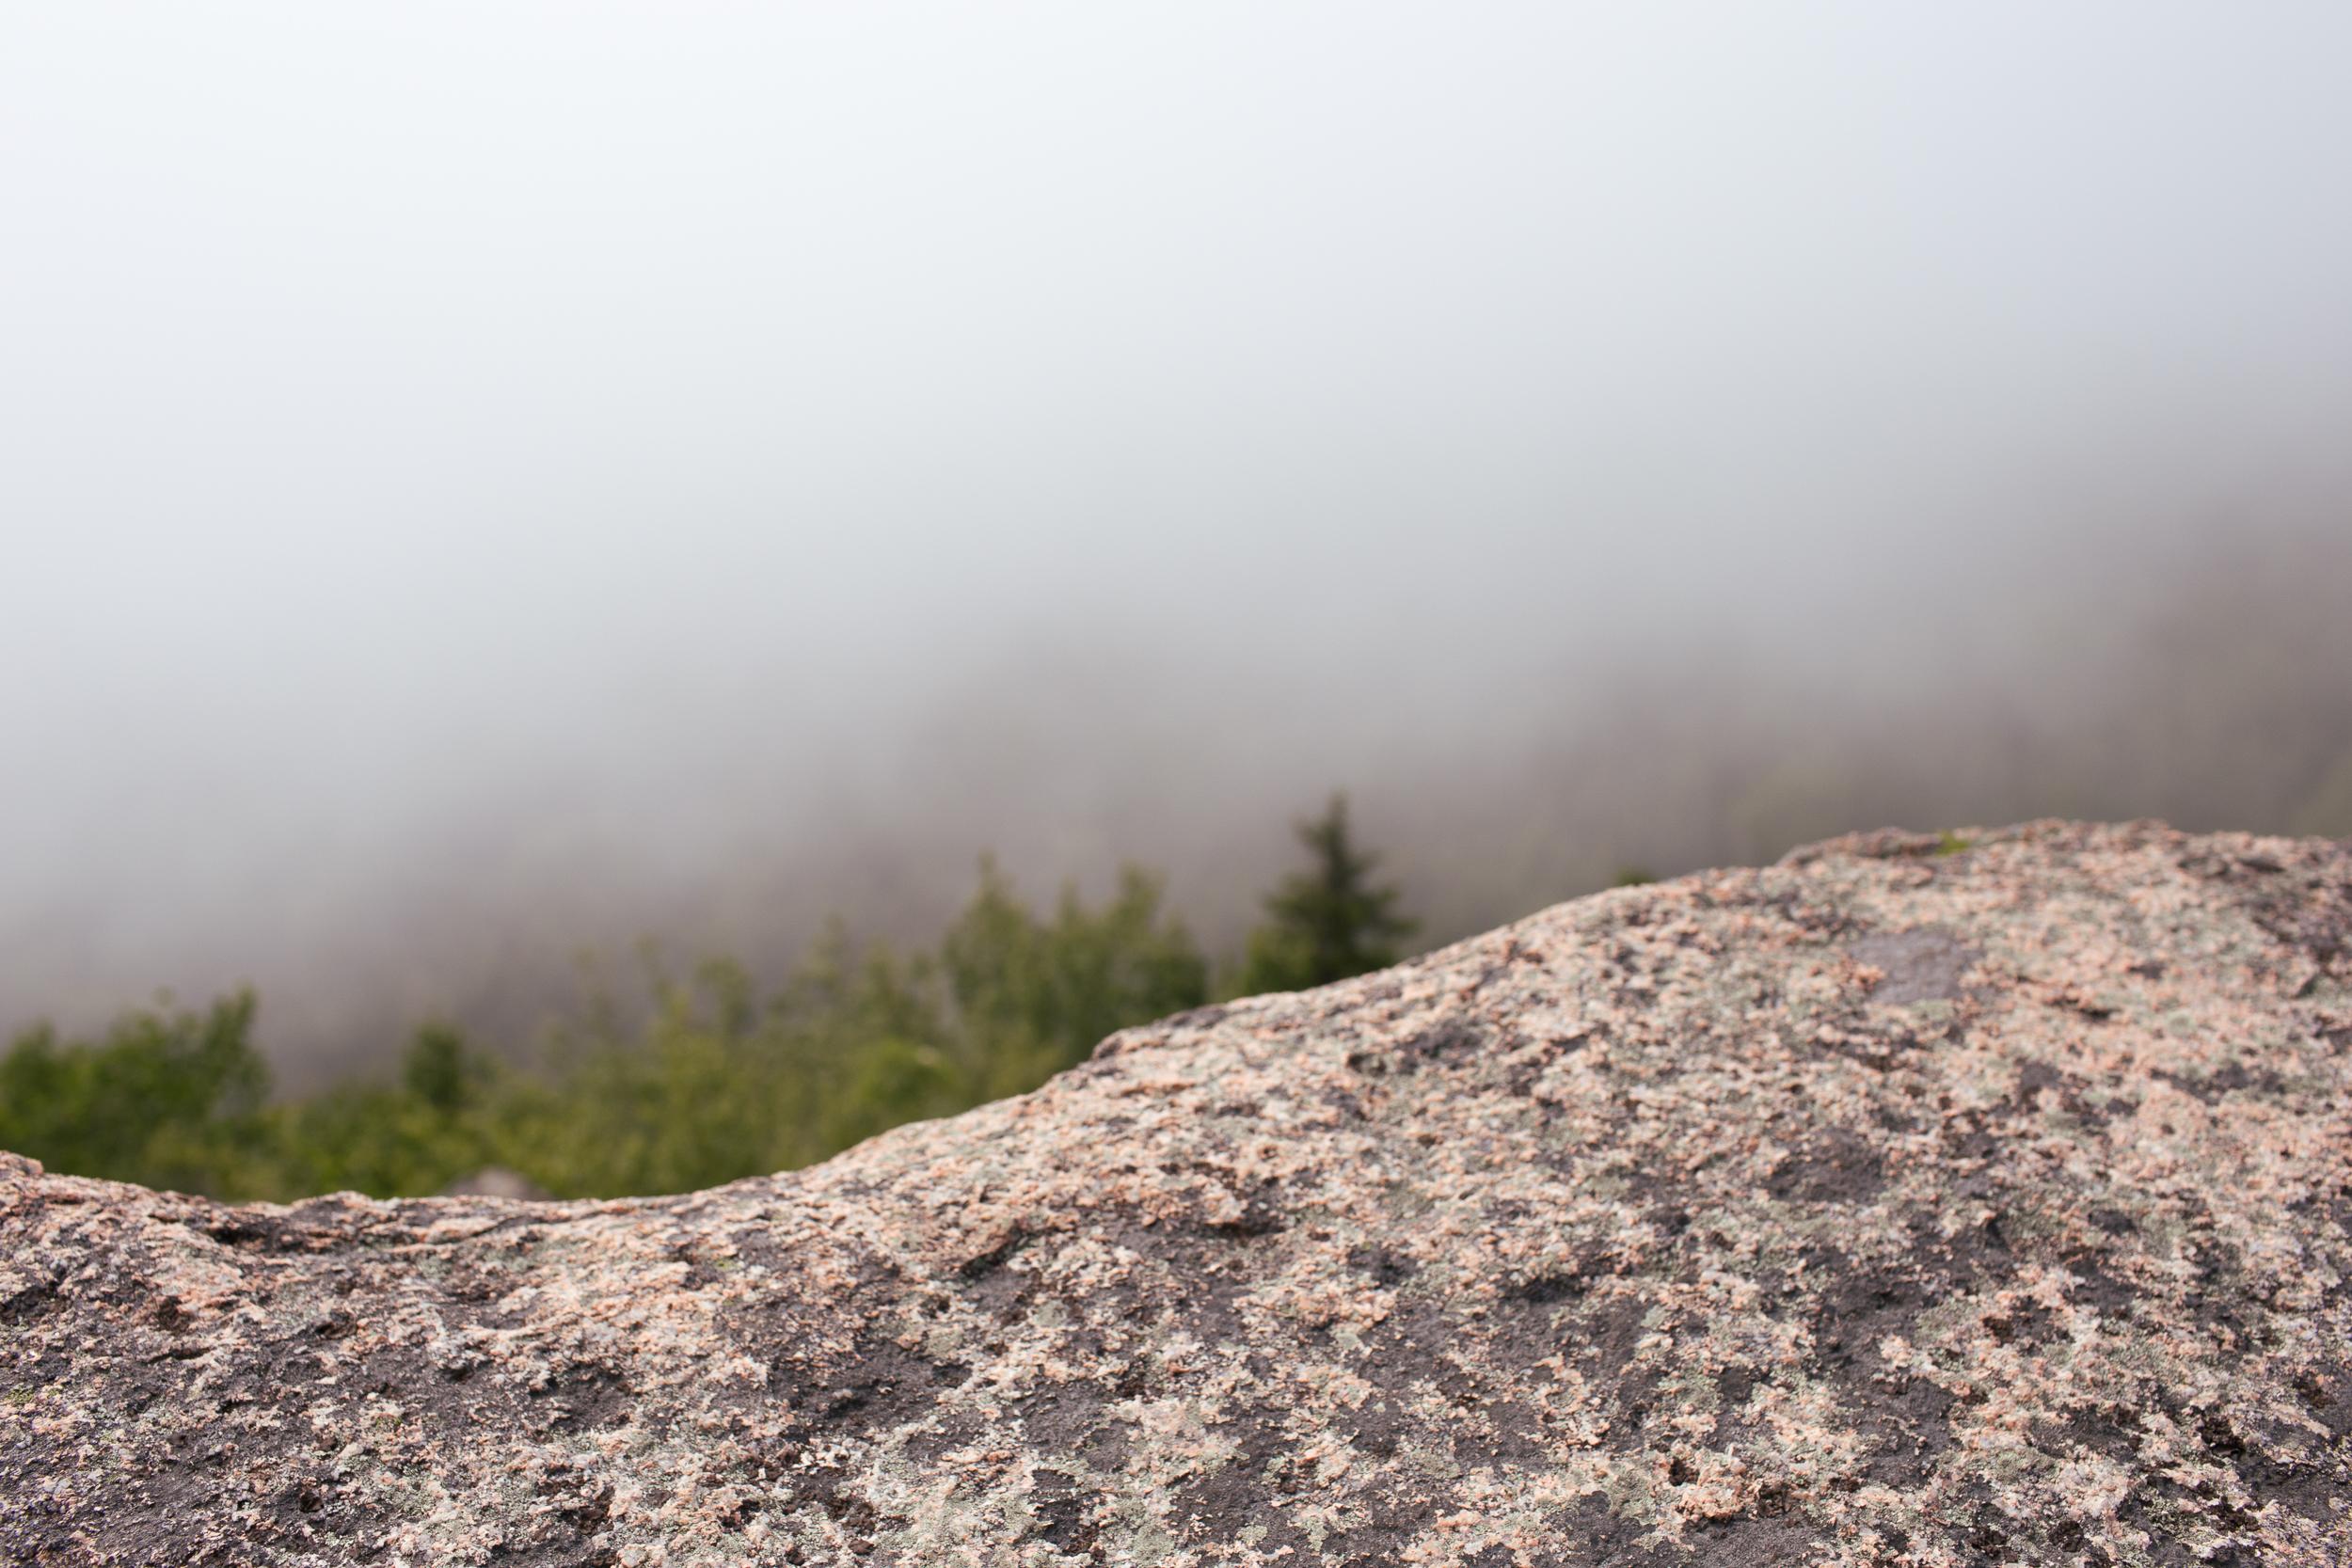 acadia-national-park-anna-mcclellan-photography-3037.jpg